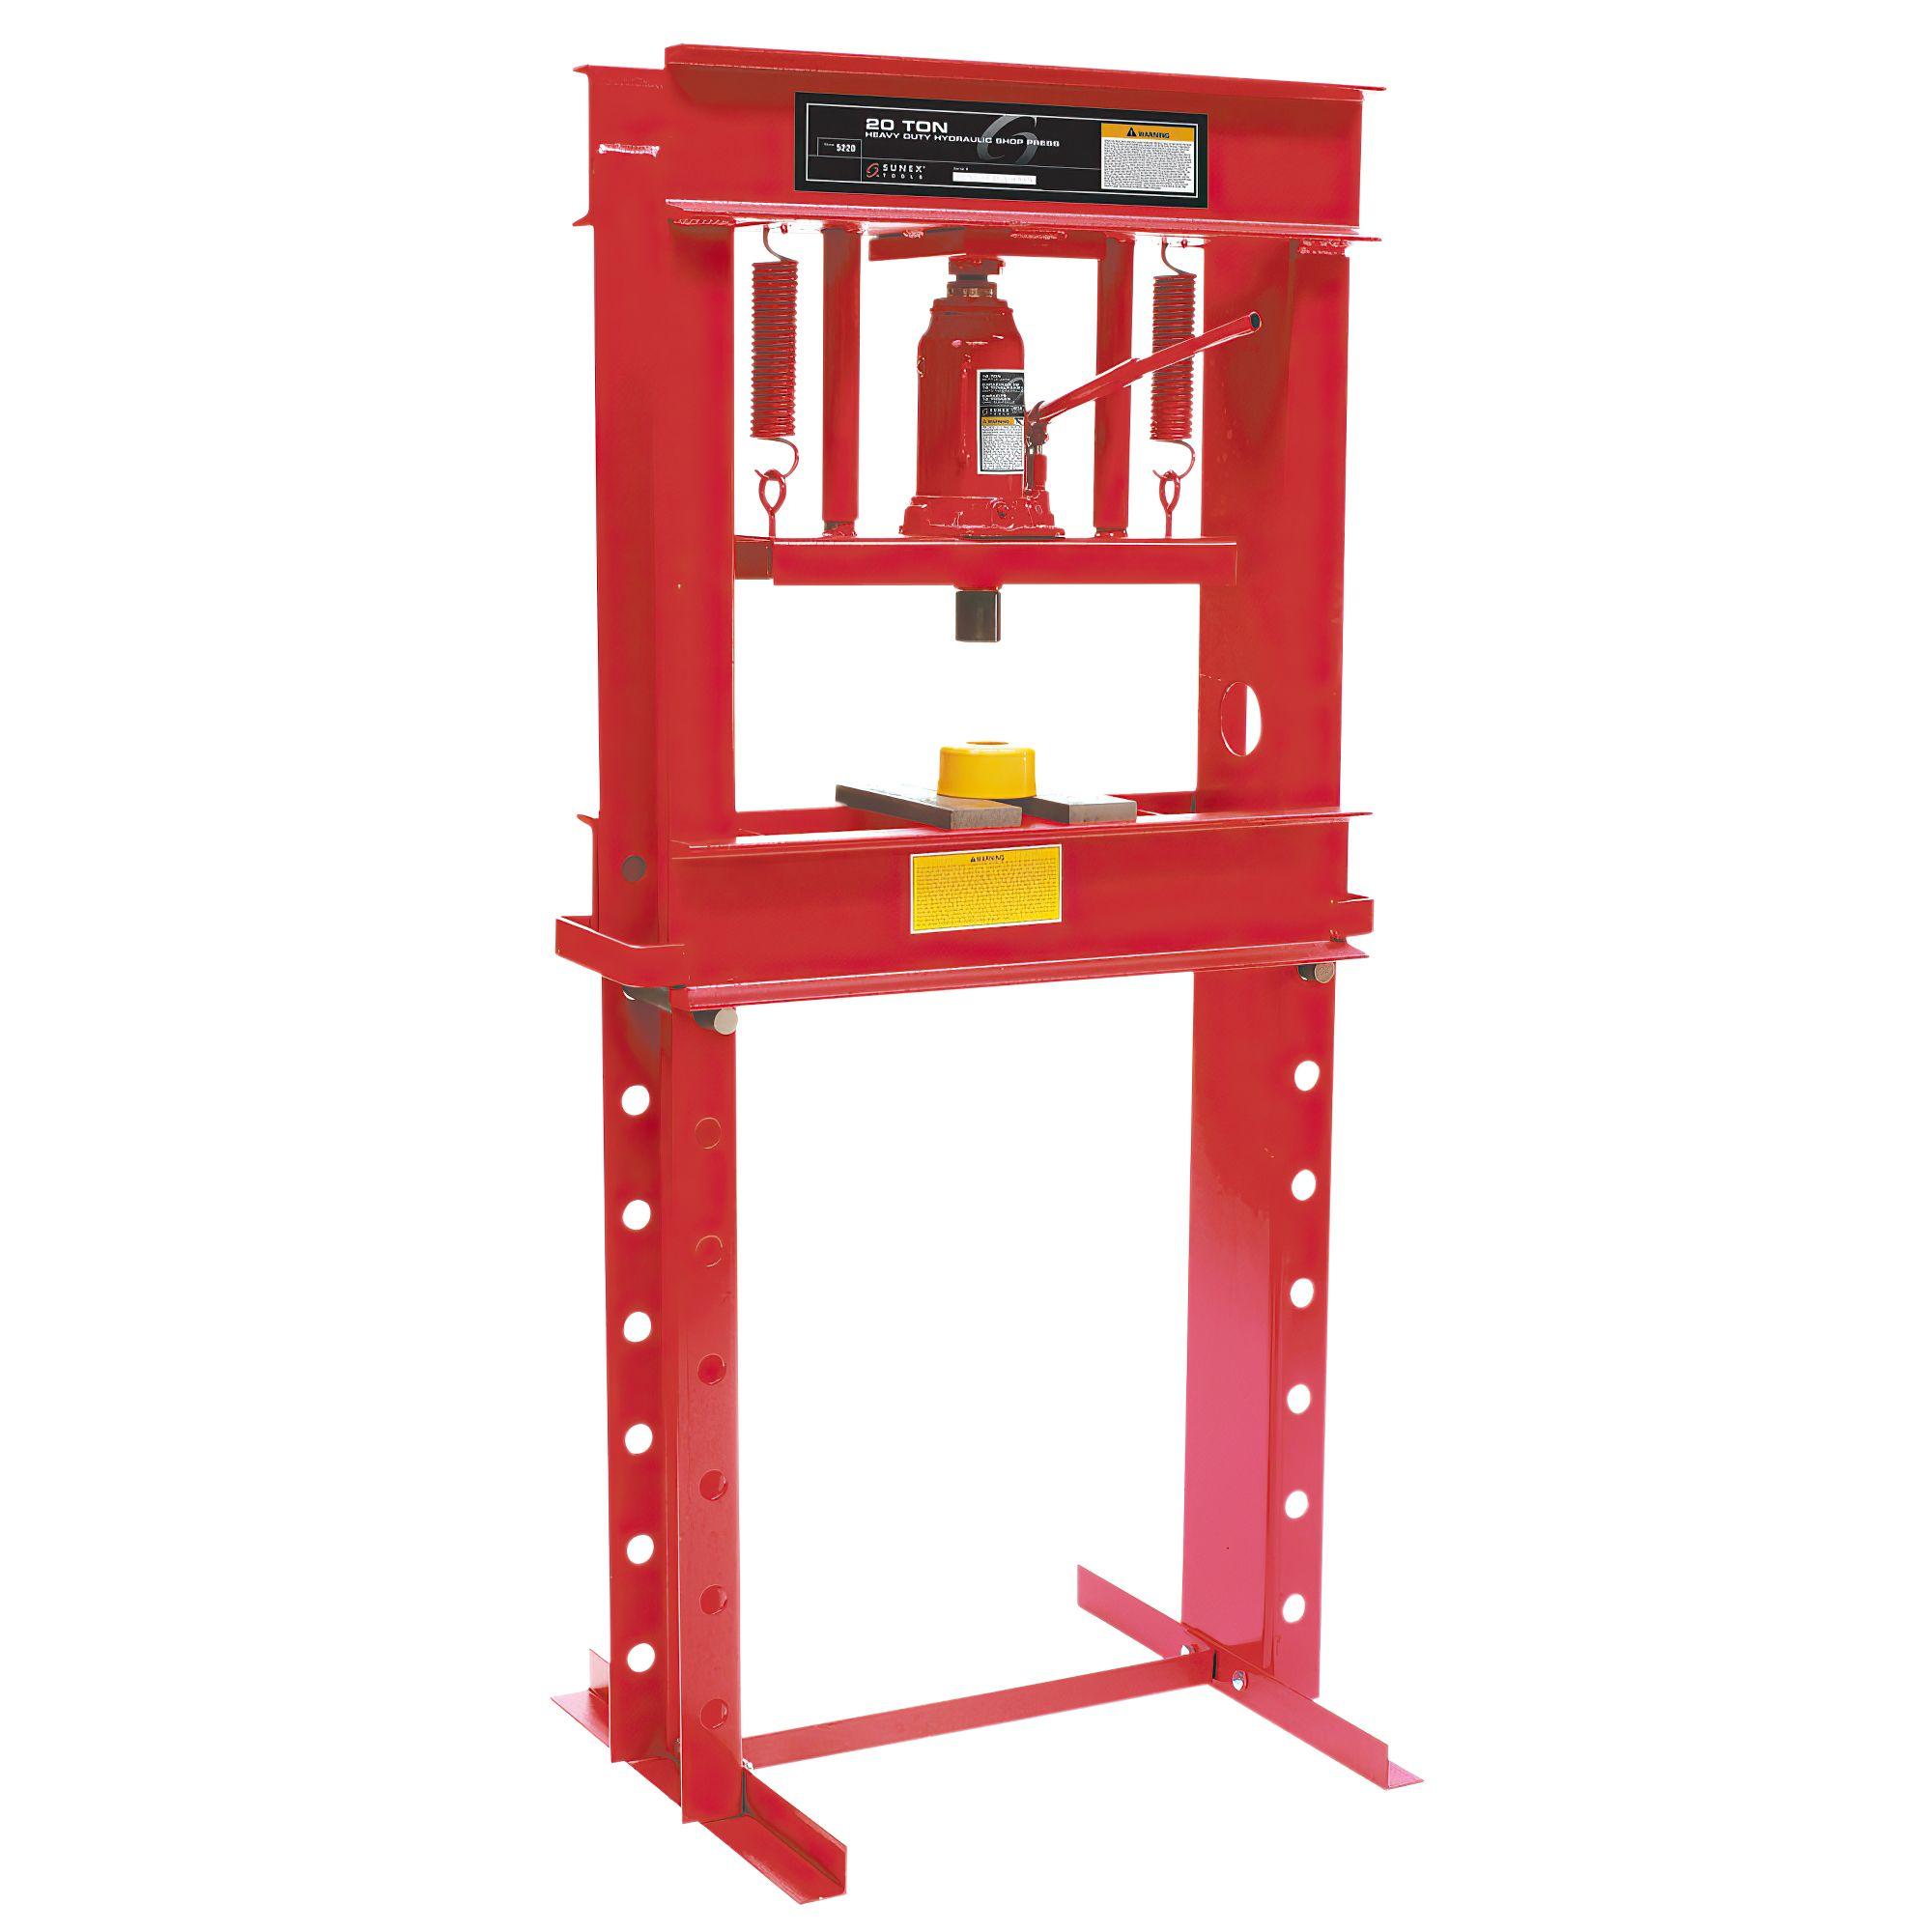 Sunex Tools SUU-5720WT 20-Ton Manual Hydraulic Shop Press Plus Heavy Duty Adjustable Work Table with Drawer